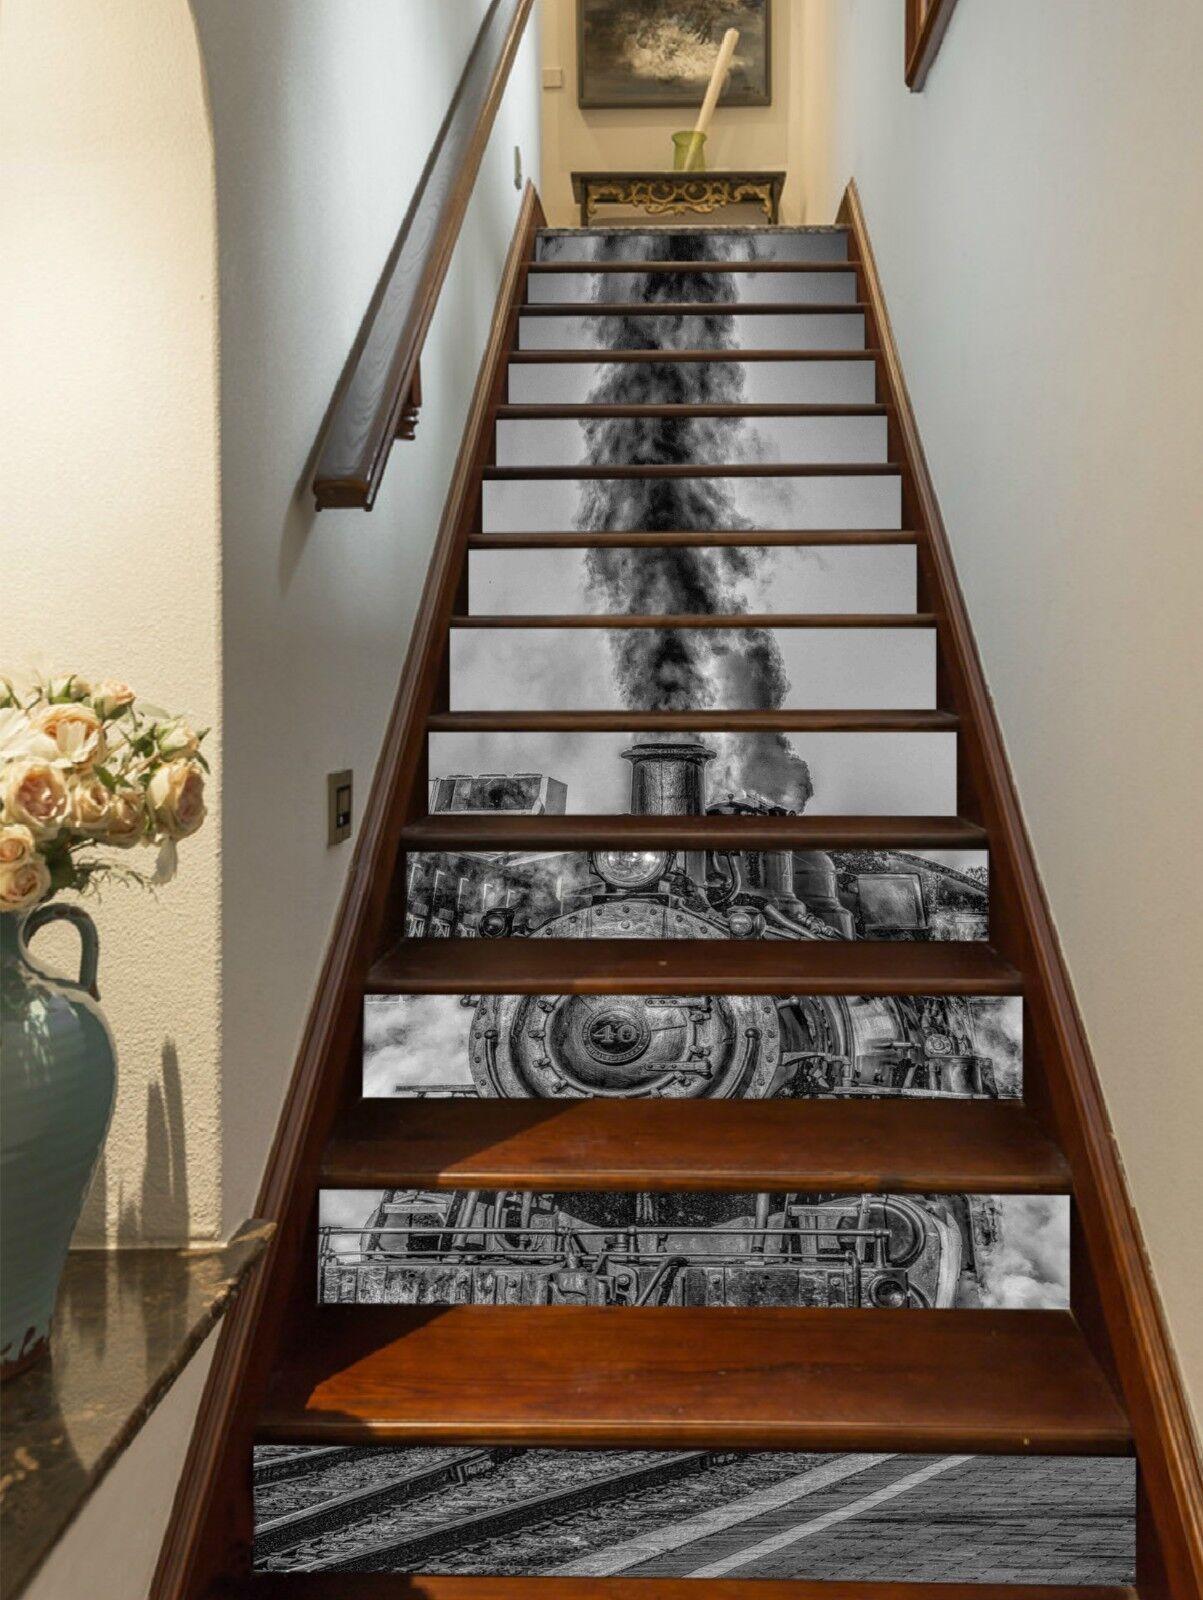 3D Jahrgang Zug 321 Stair Risers Dekoration Fototapete Vinyl Aufkleber Tapete DE